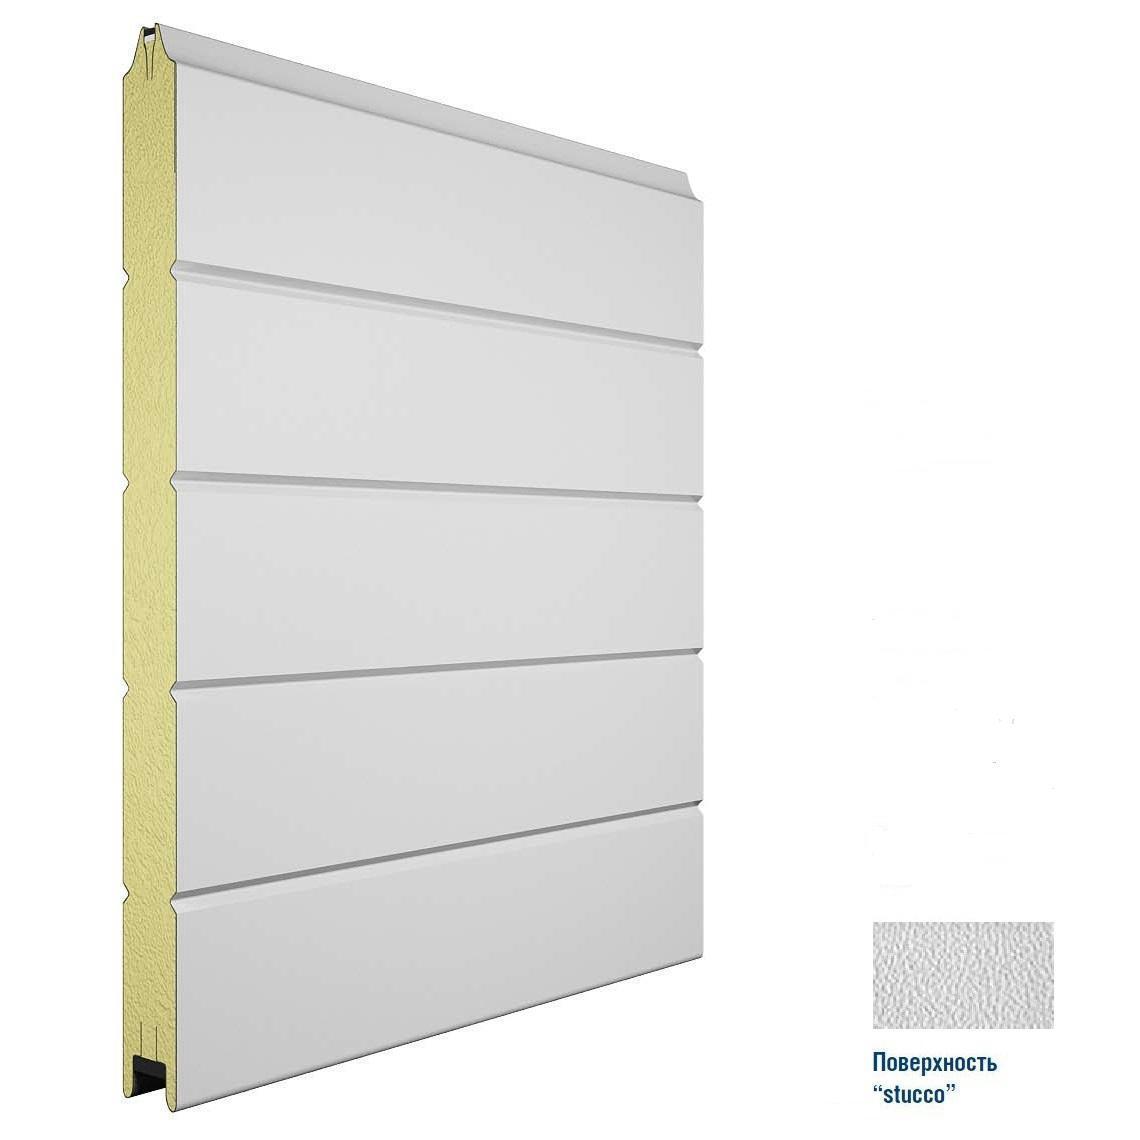 Панель 475мм Нстукко/Нстукко Белый(RAL9003)/Белый(RAL9003) 11150